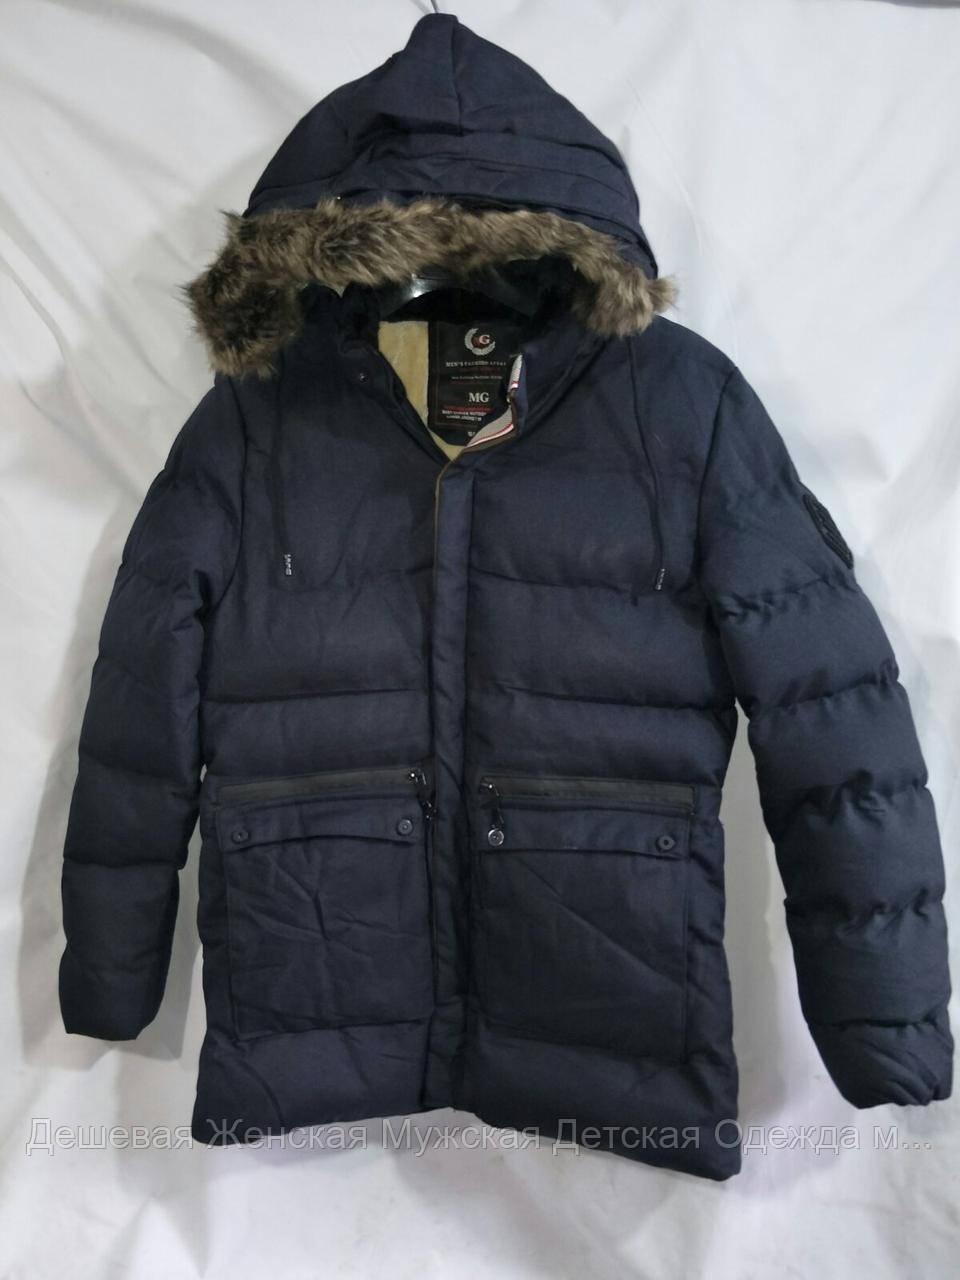 Куртка чоловіча, зима